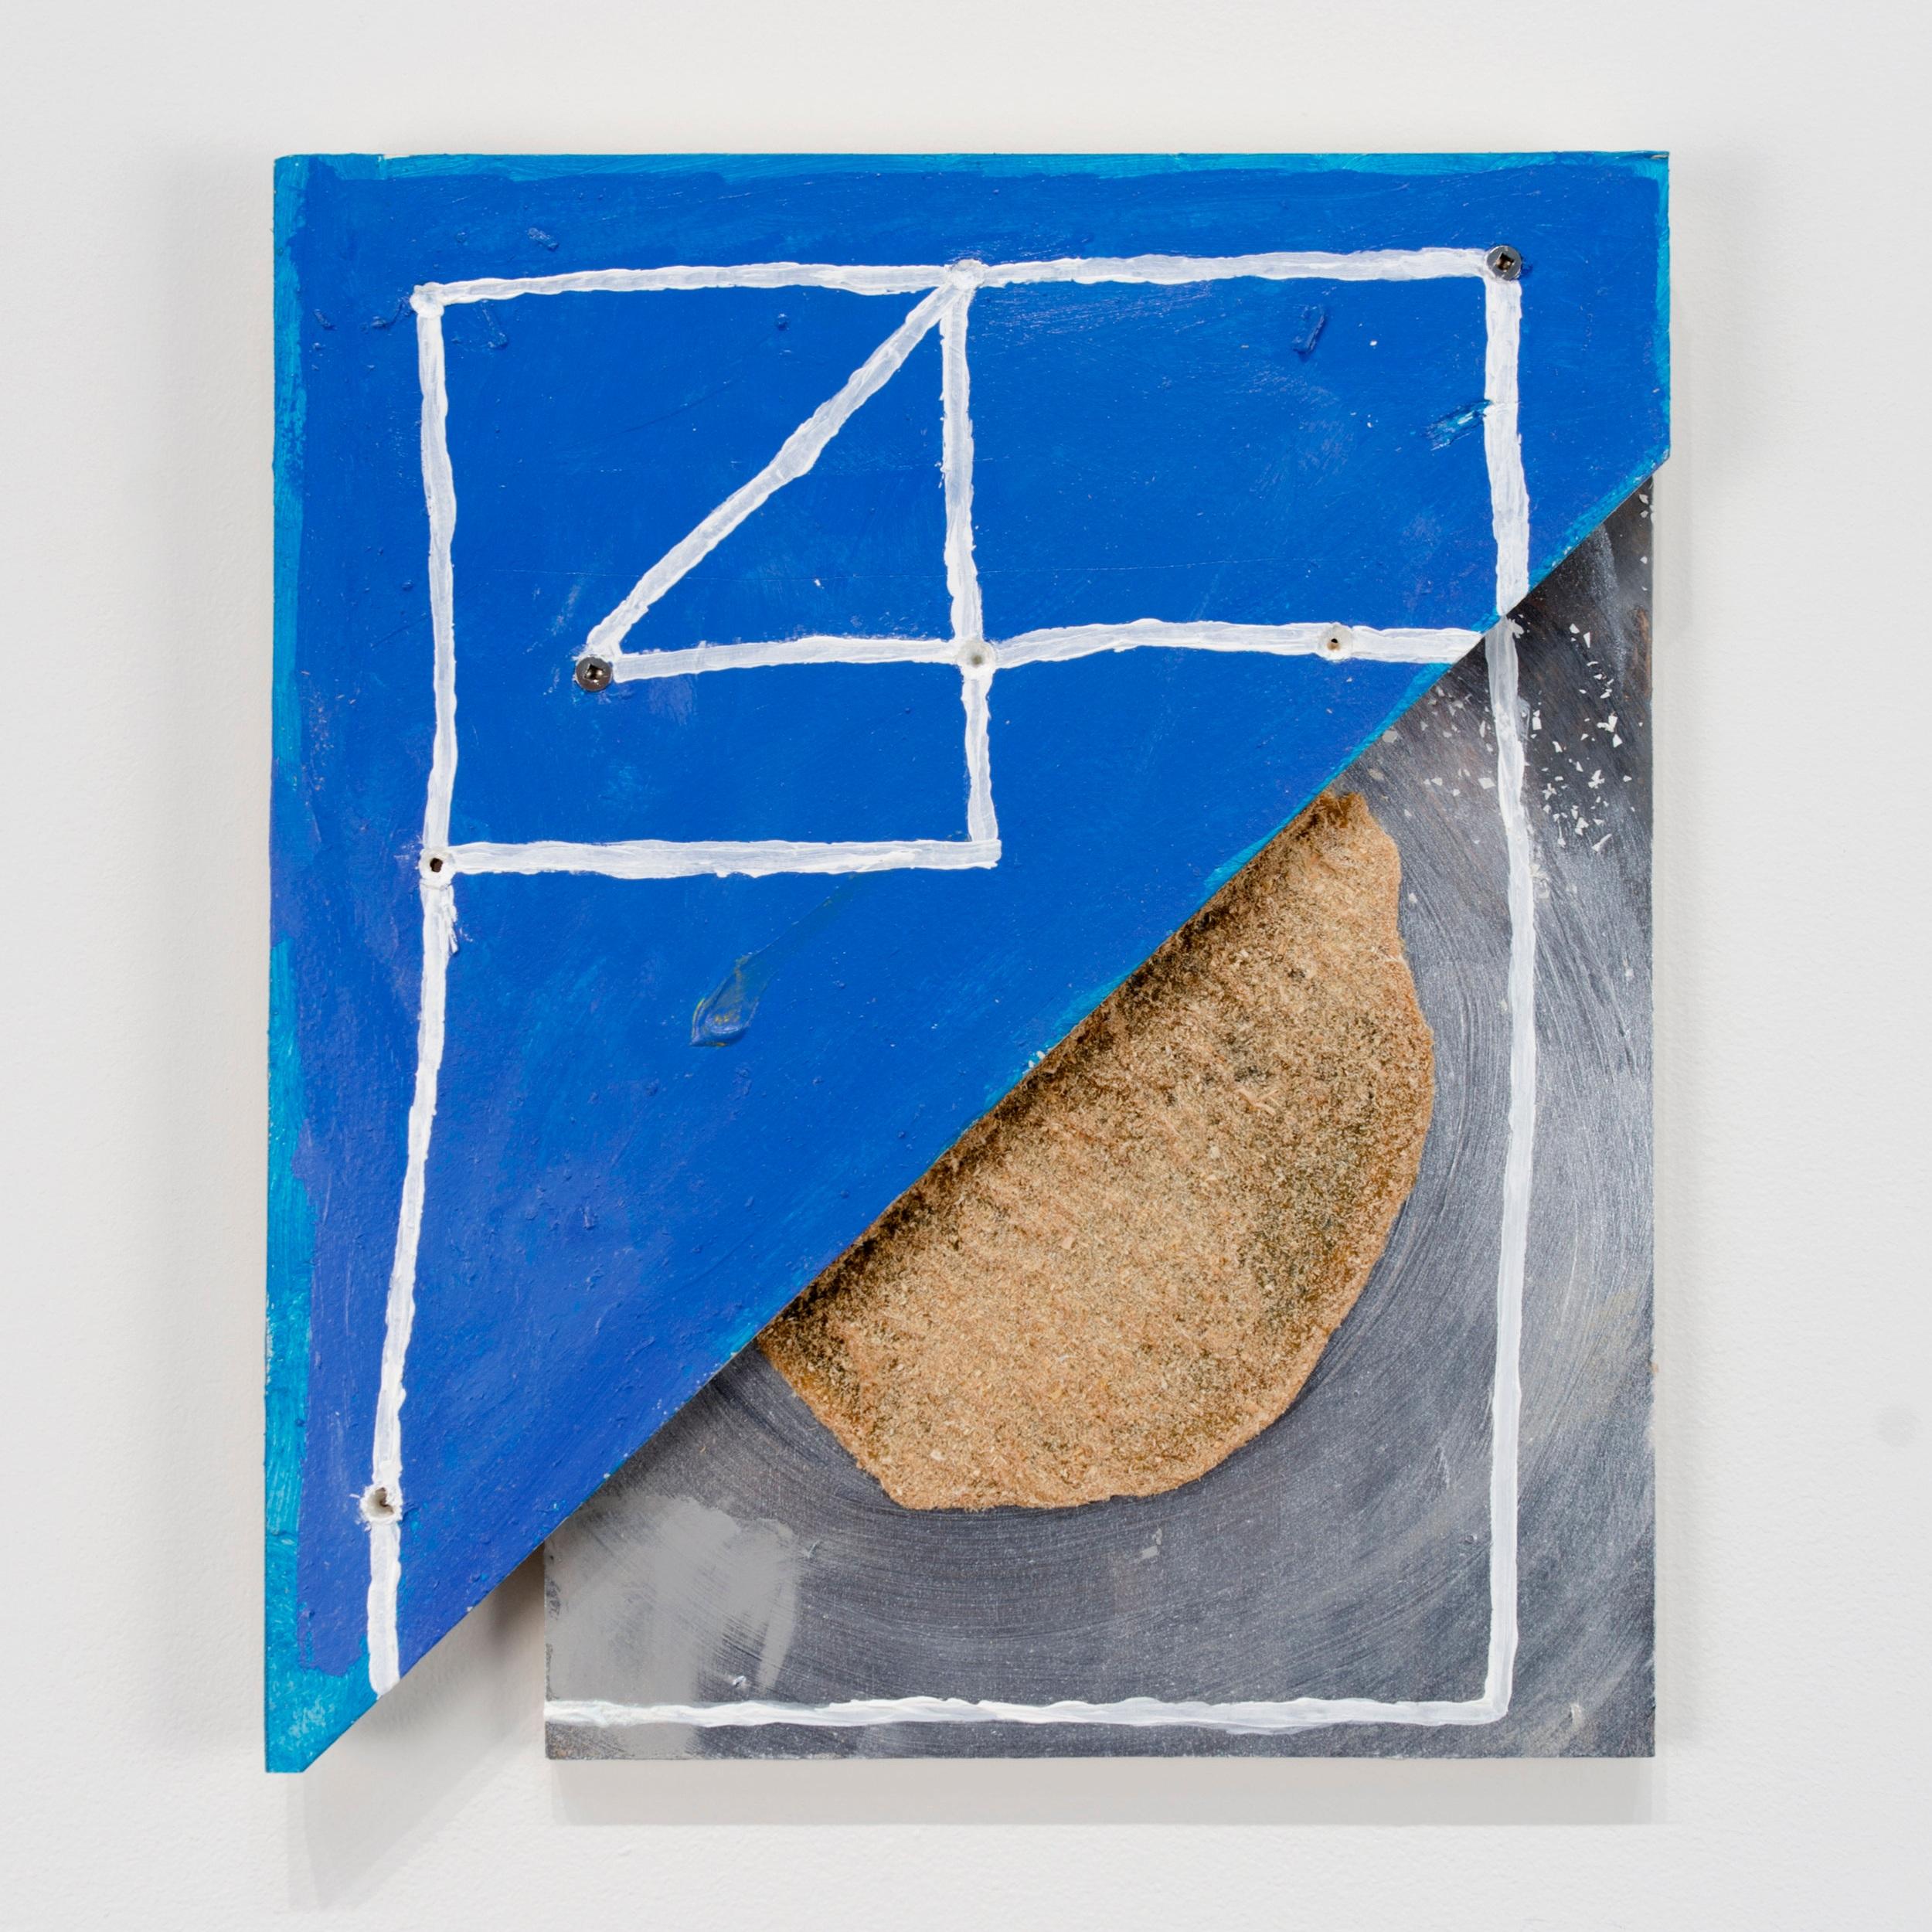 """40 , ""  2016  Acrylic, sawdust, and epoxy on wood  13 3/4 x 11 3/4 x 1 inches"